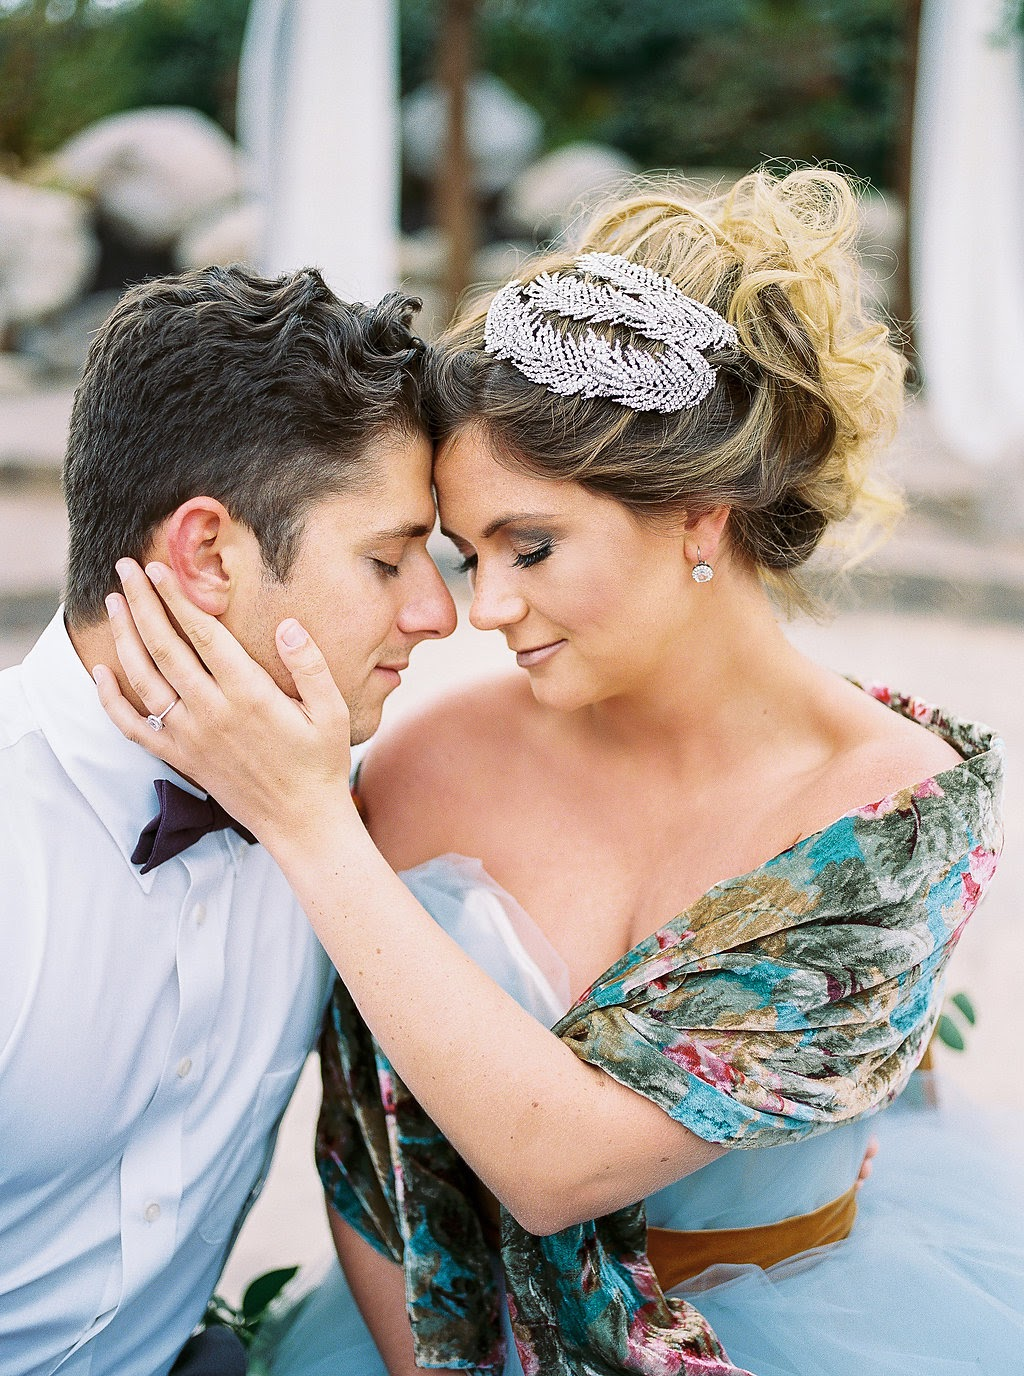 Alexandra-Elise-Photography-Ali-Reed-Film-Wedding-Photographer-Deerfield-Country-Club-013.jpg